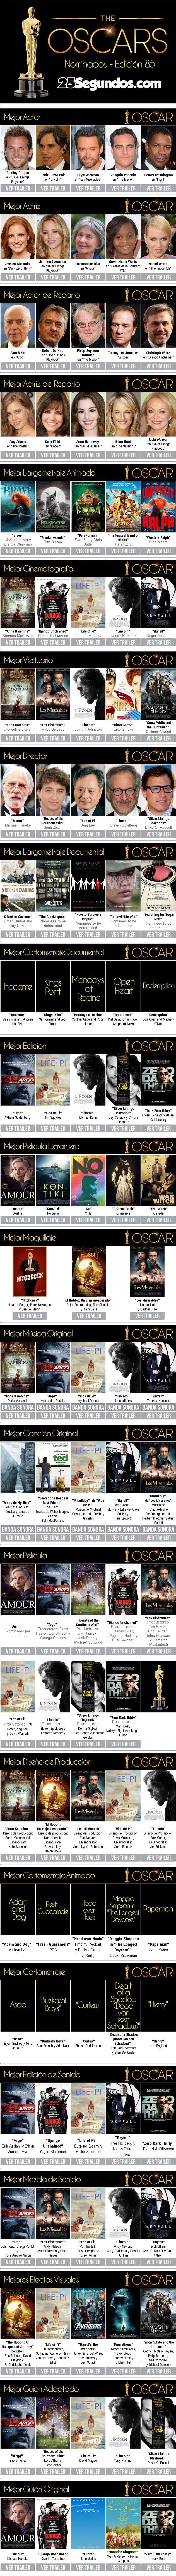 Nominados a los Oscars 2013 #infografia #infographic